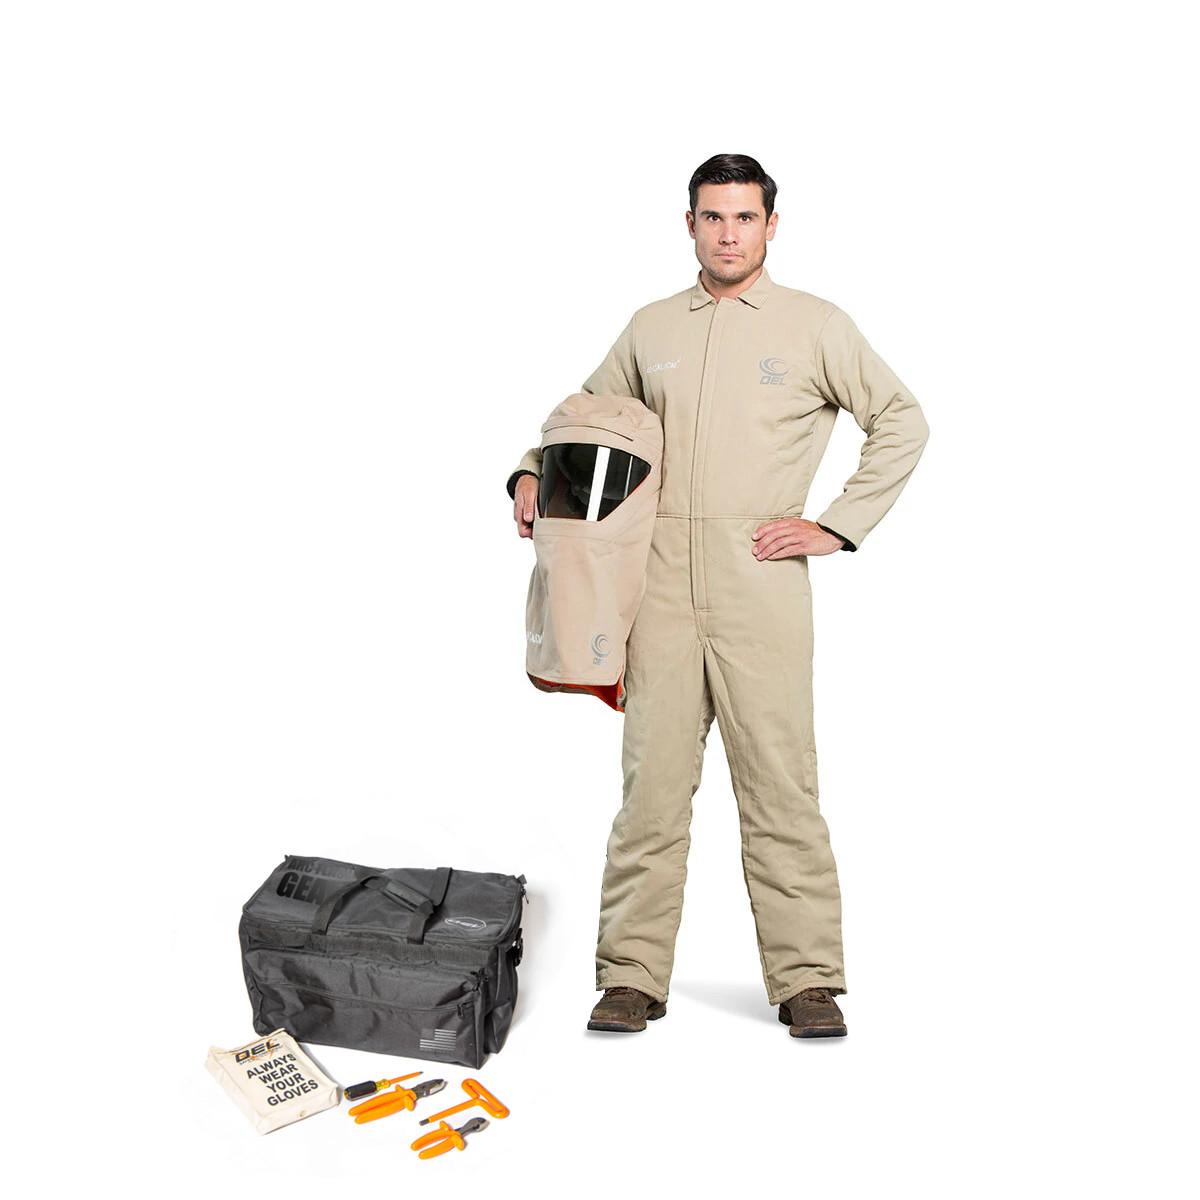 40 CAL Standard Coveralls Kit